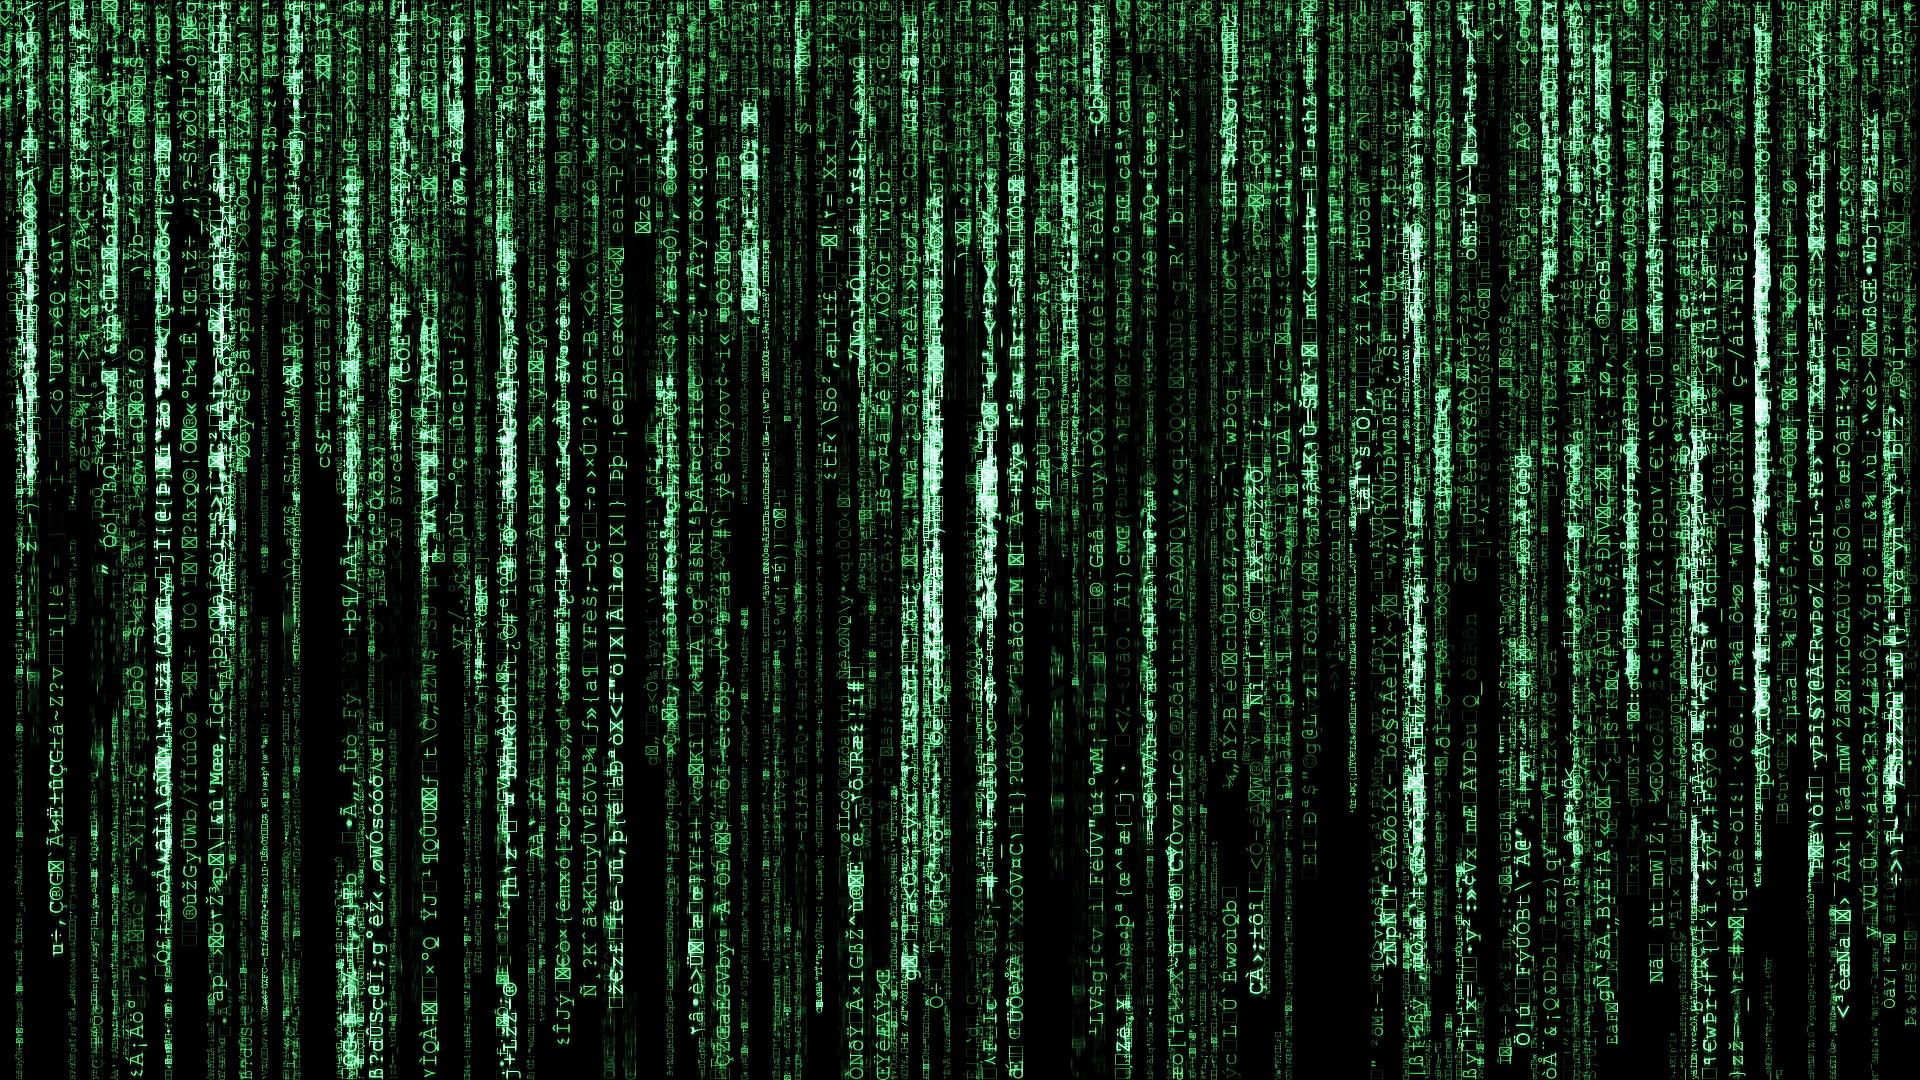 Fonds dcran Hacker tous les wallpapers Hacker 1920x1080